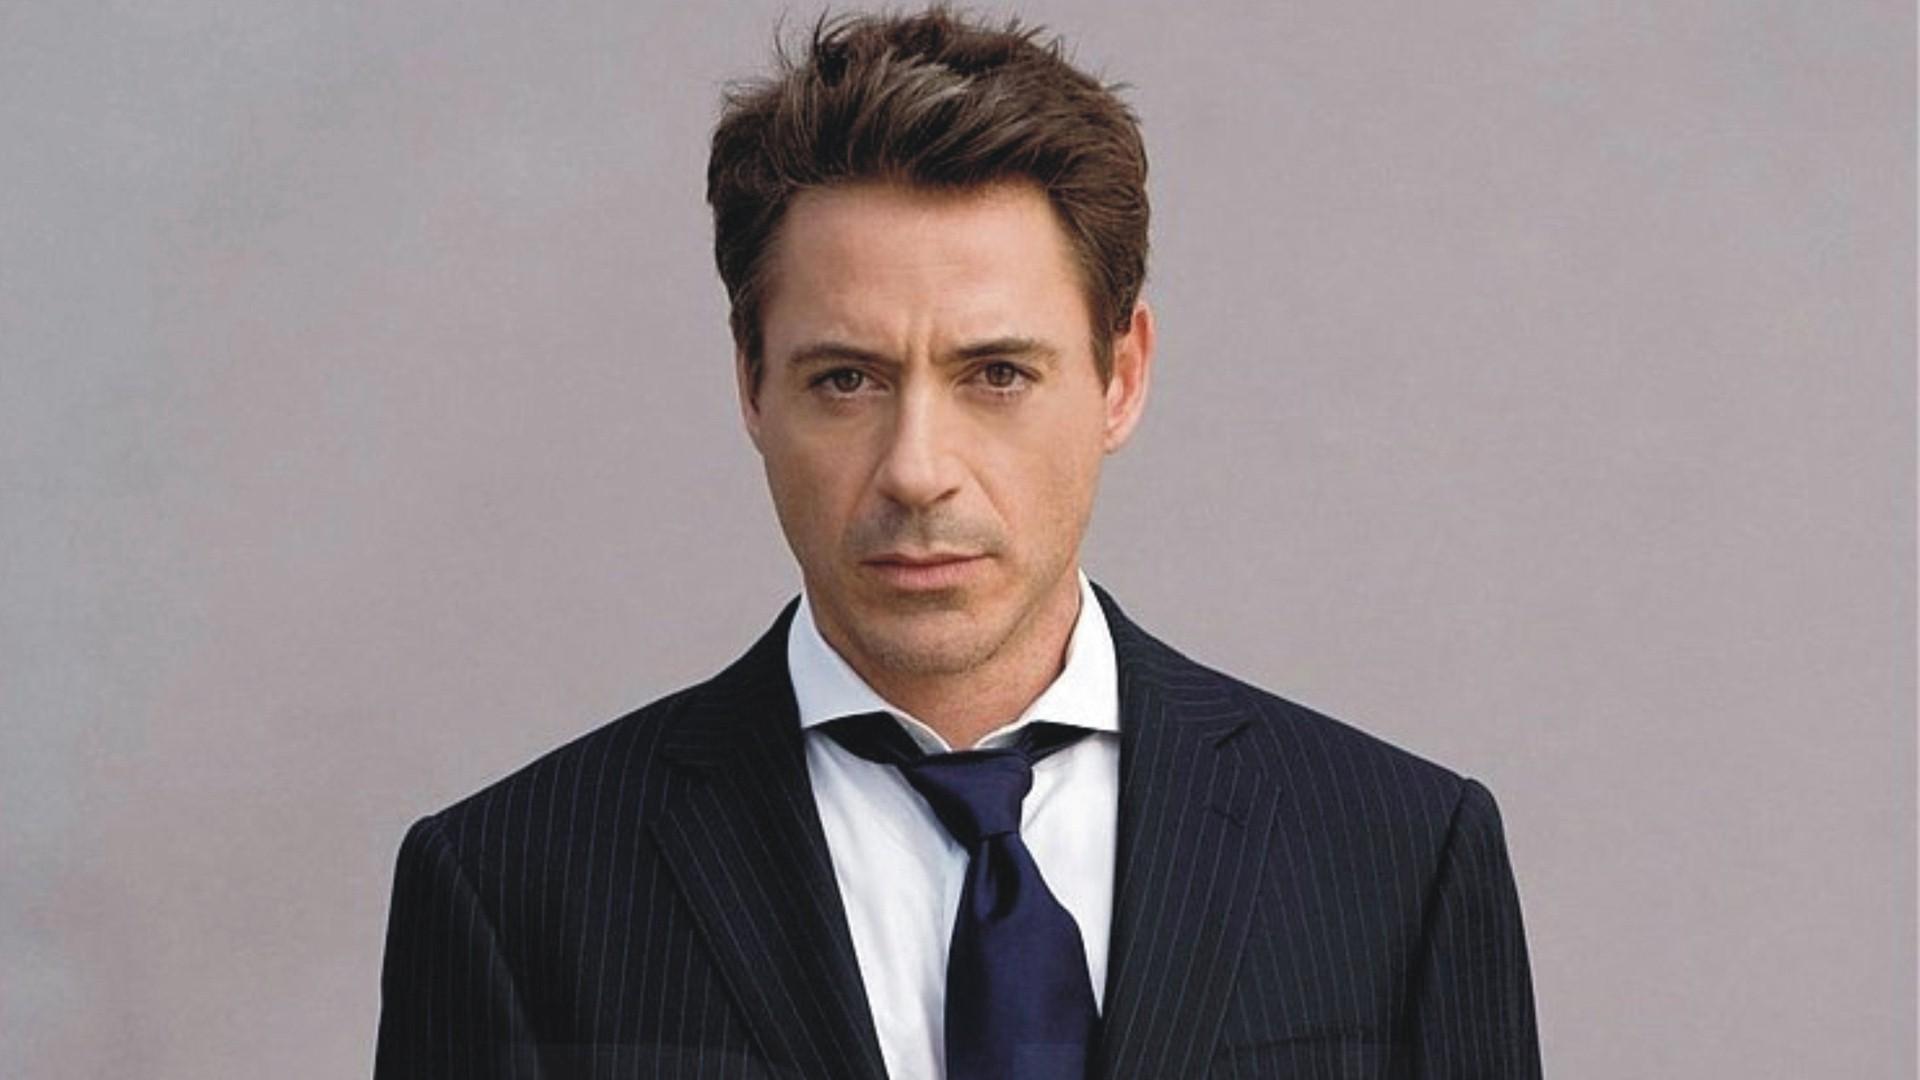 Robert Downey Jr Wallpapers Wallpapertag